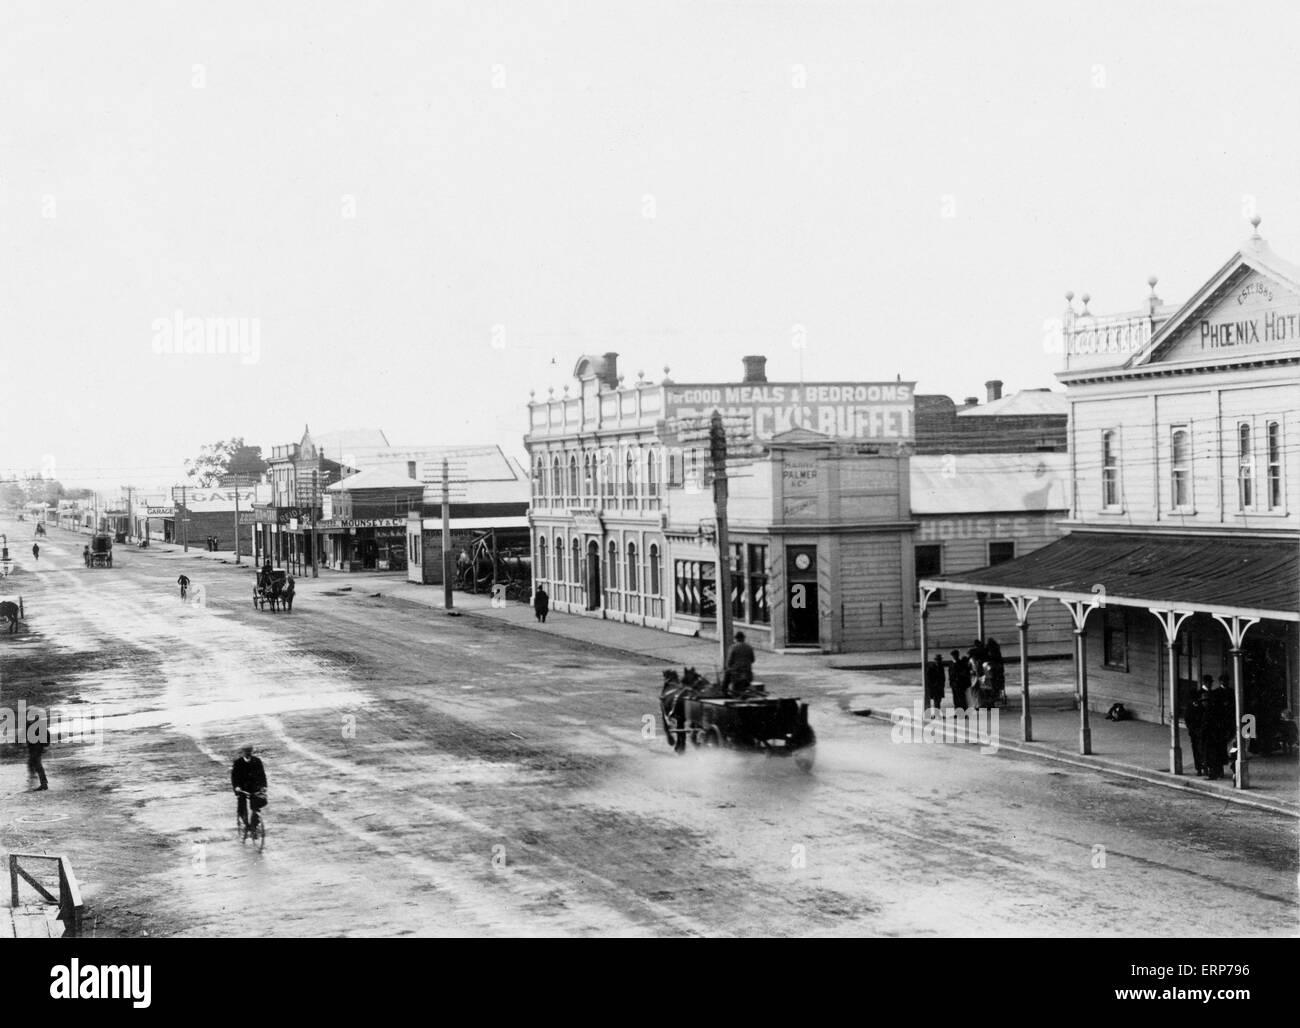 Rangitikei Street, Palmerston North, New Zealand, c.1900 - Stock Image